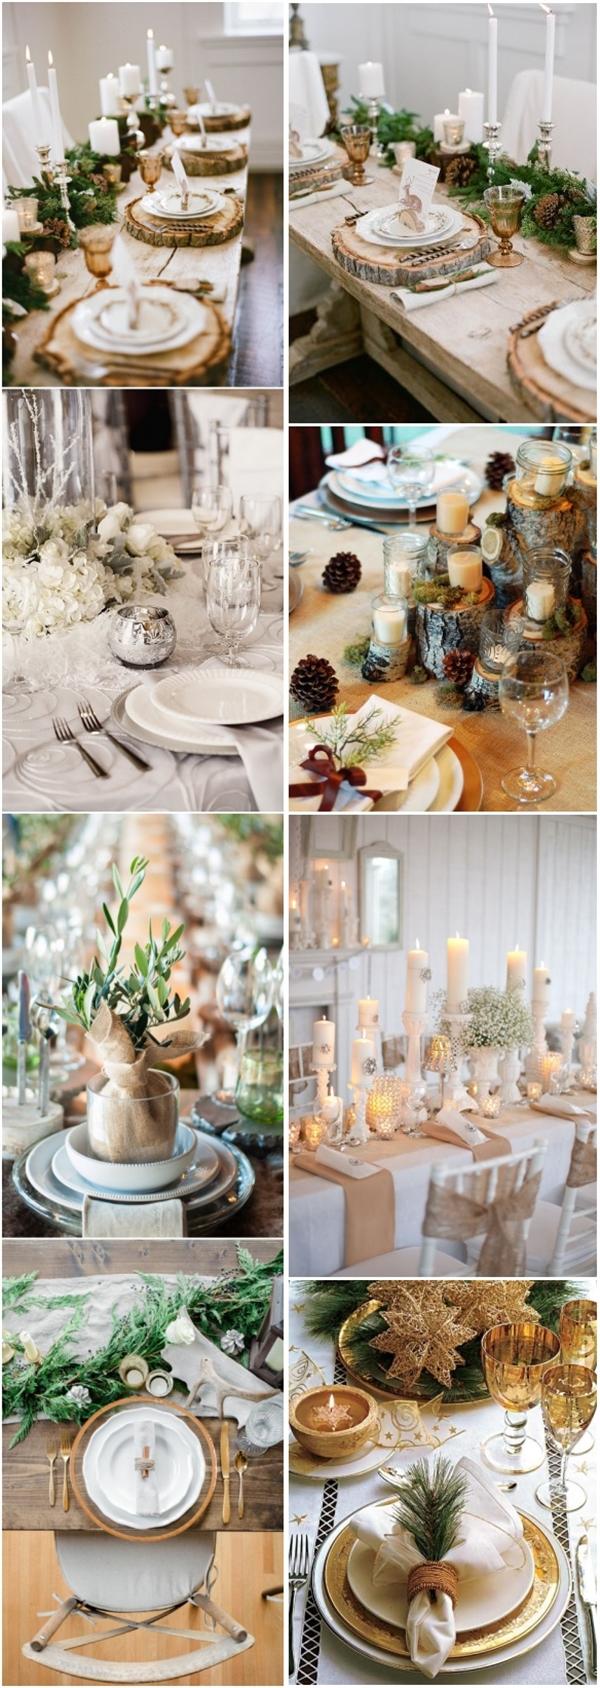 Winter Wedding Decorations 30 Spectacular Winter Wedding Table Setting Ideas Deer Pearl Flowers